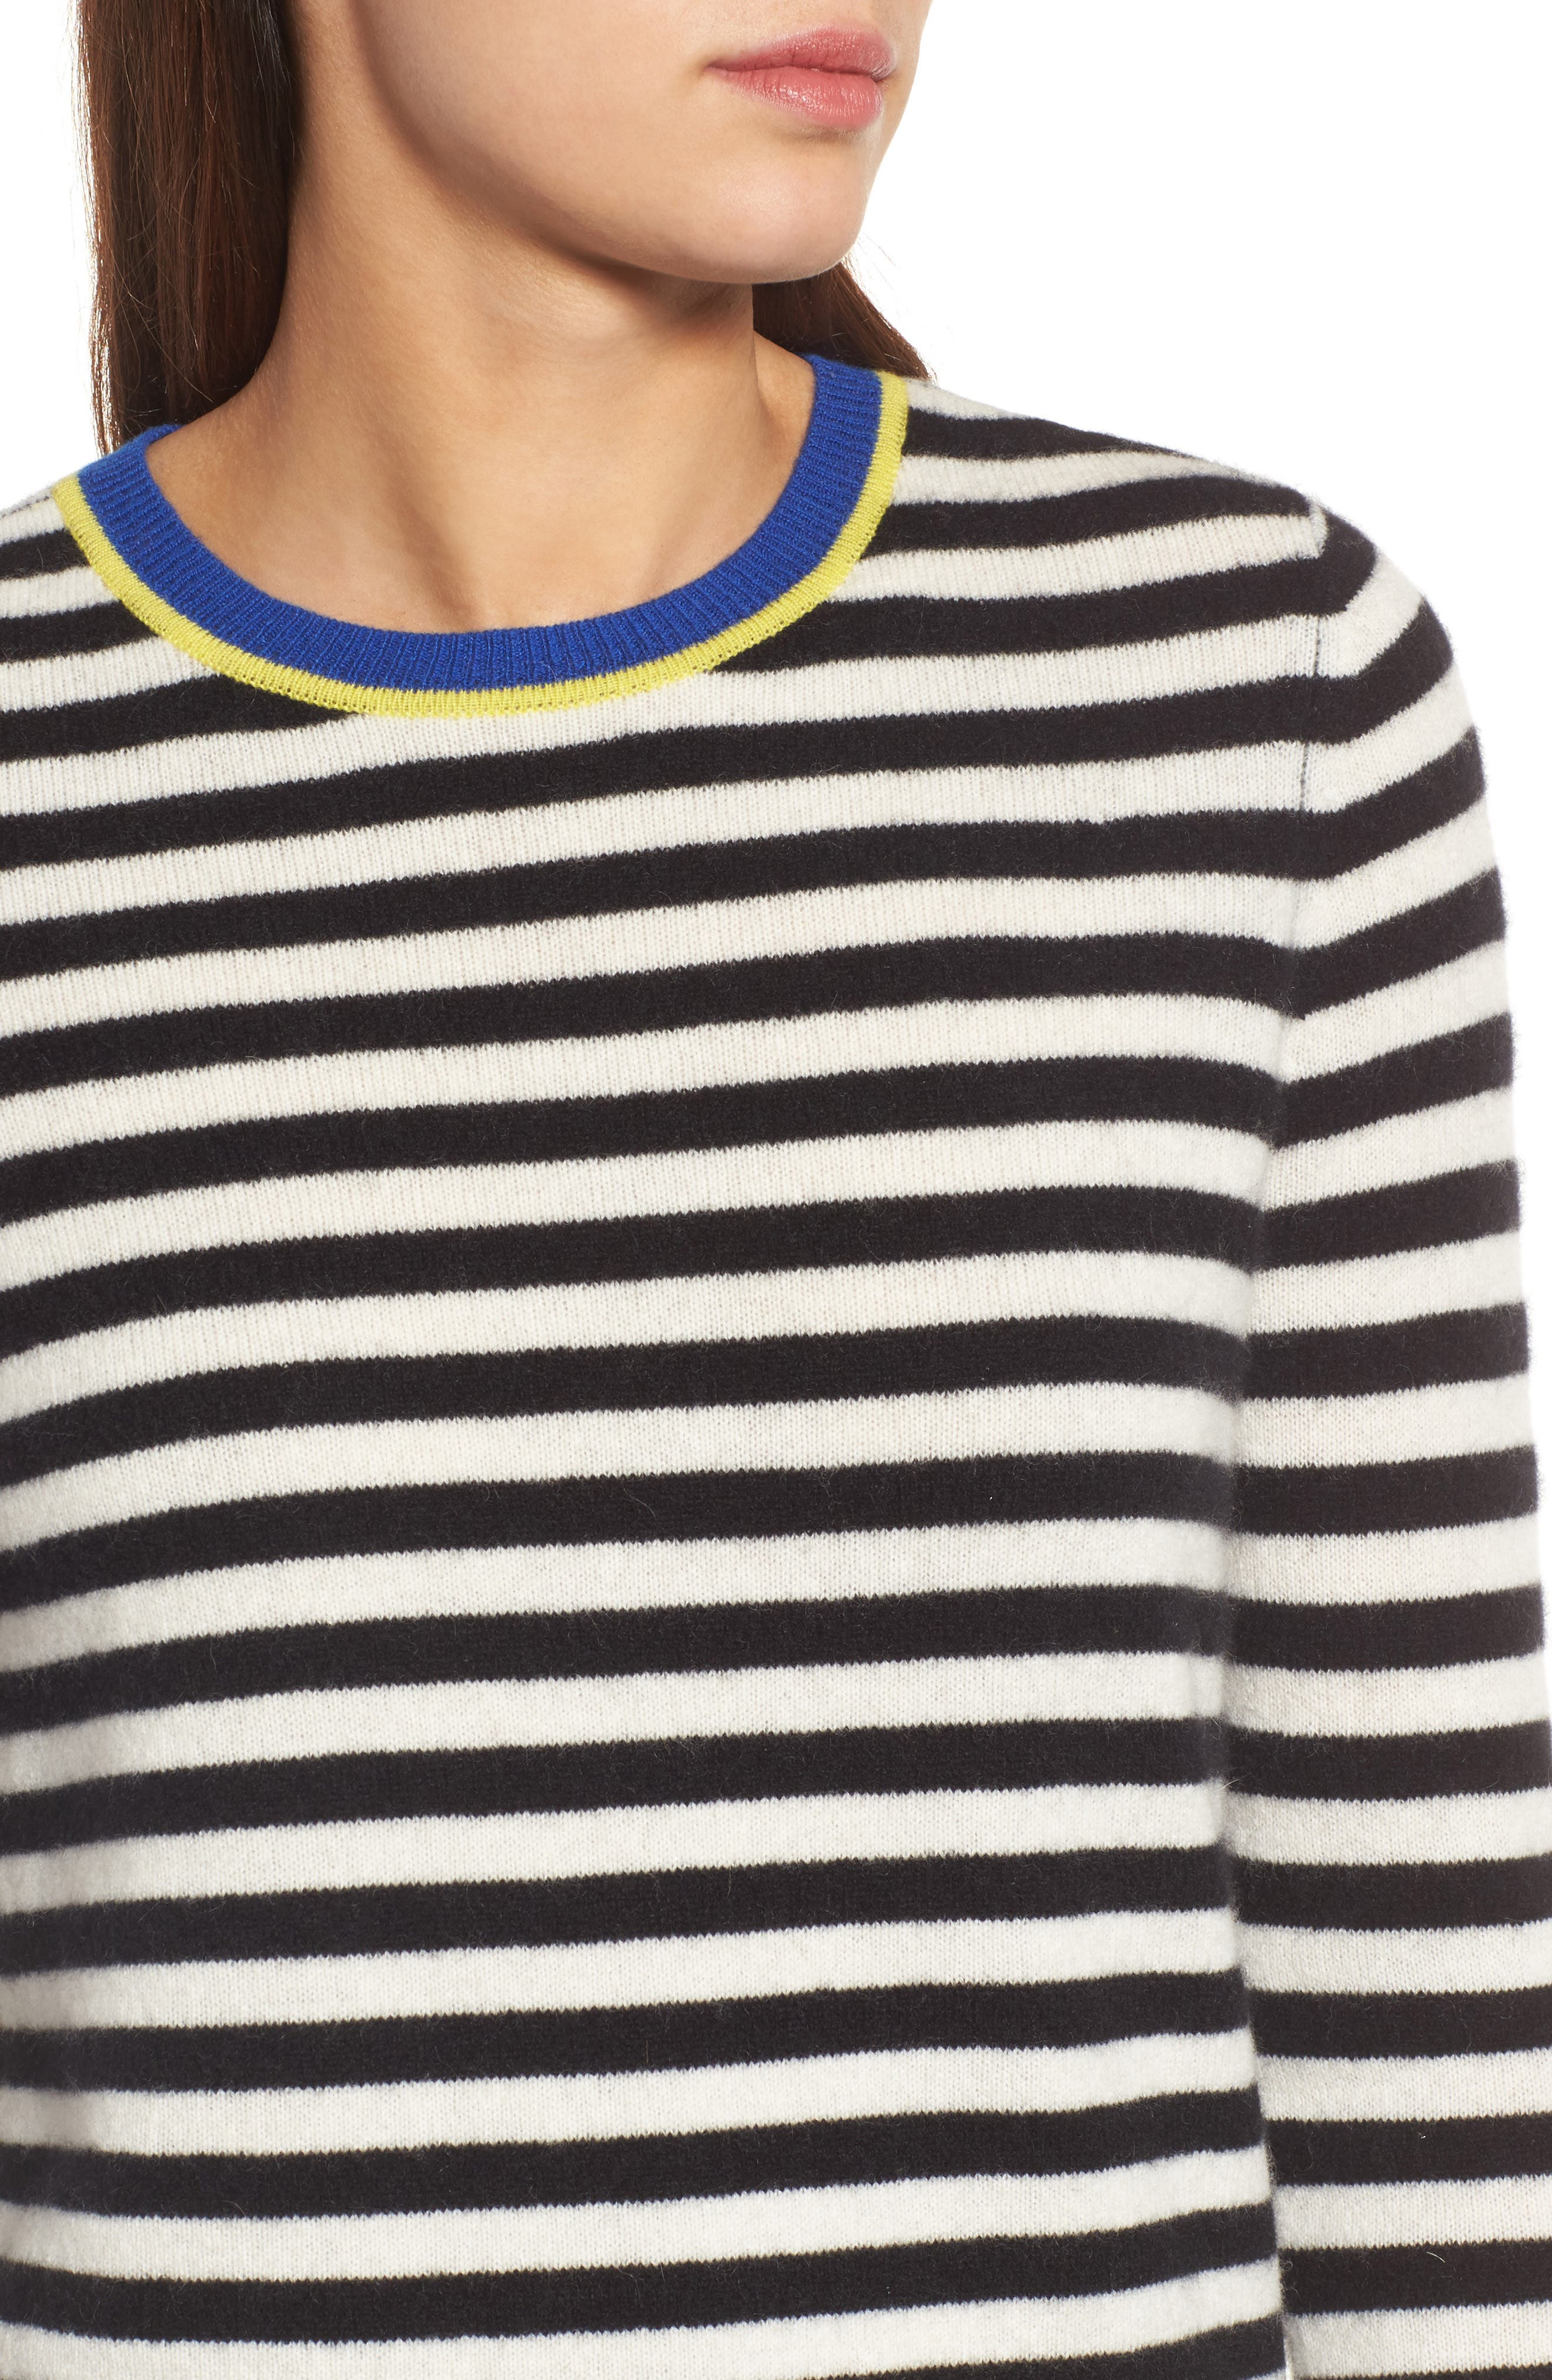 Stripe Cashmere Sweater,                             Alternate thumbnail 4, color,                             001